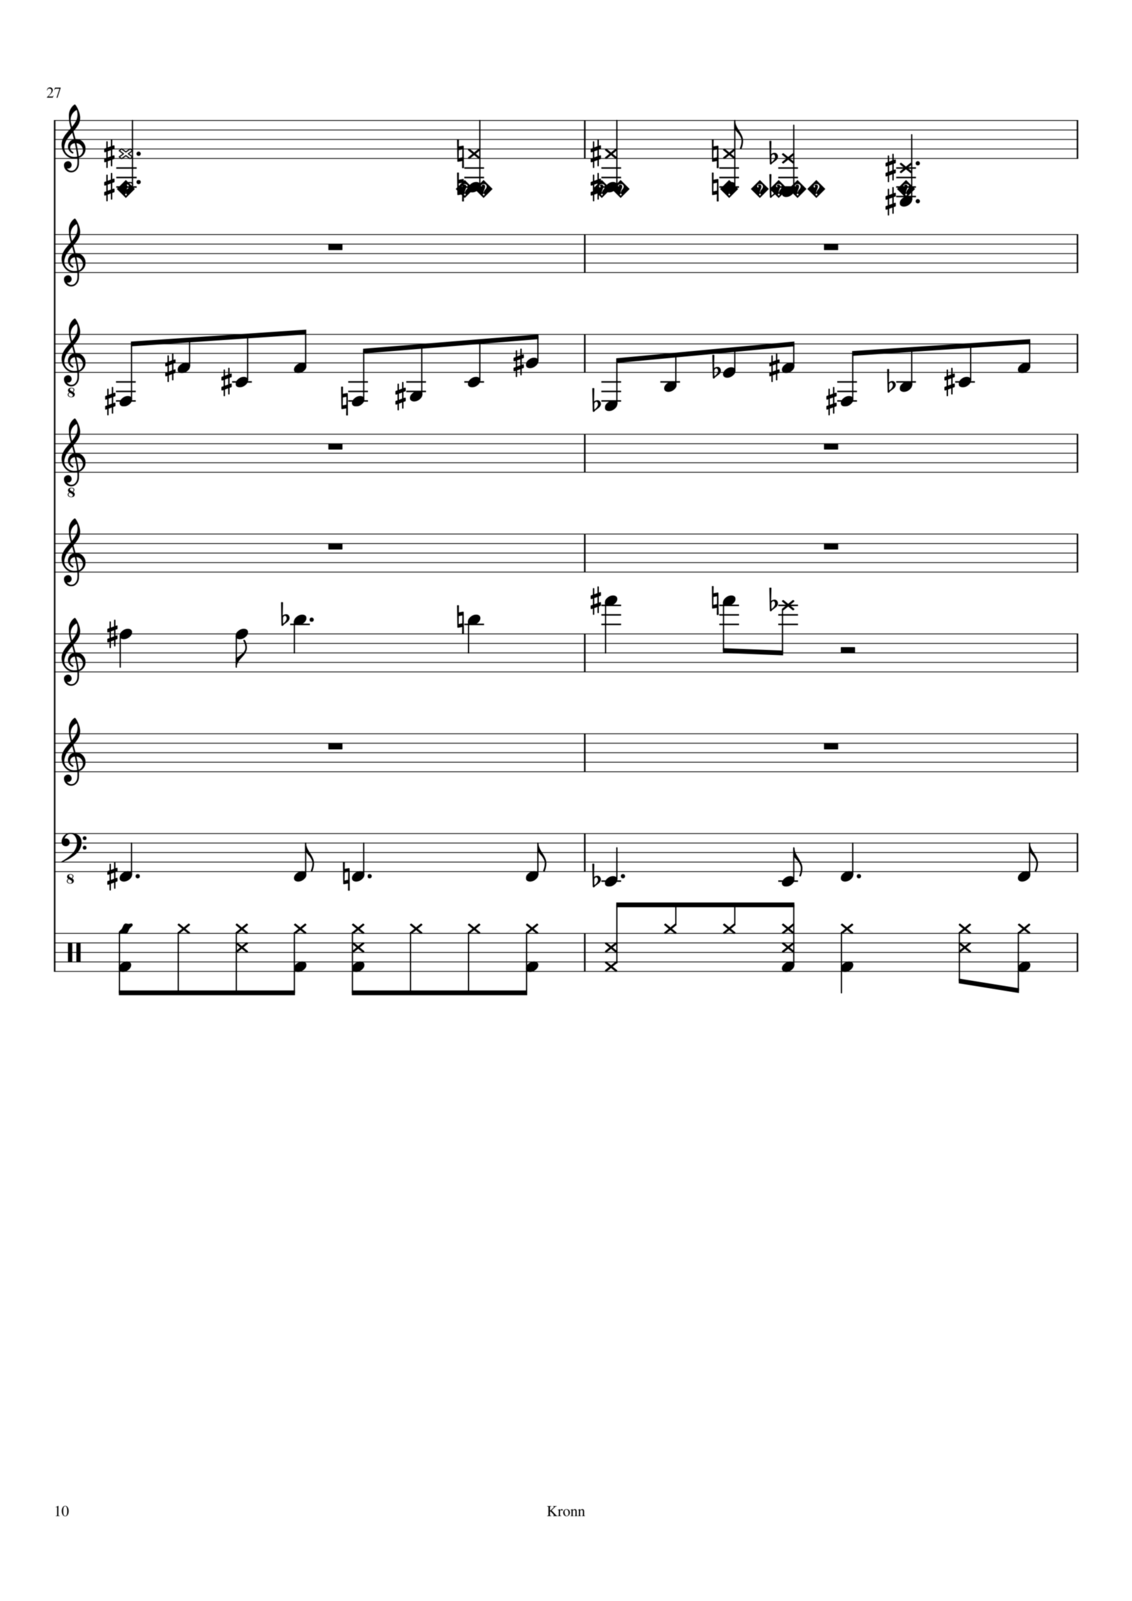 Ispoved Pervogo Boga slide, Image 10